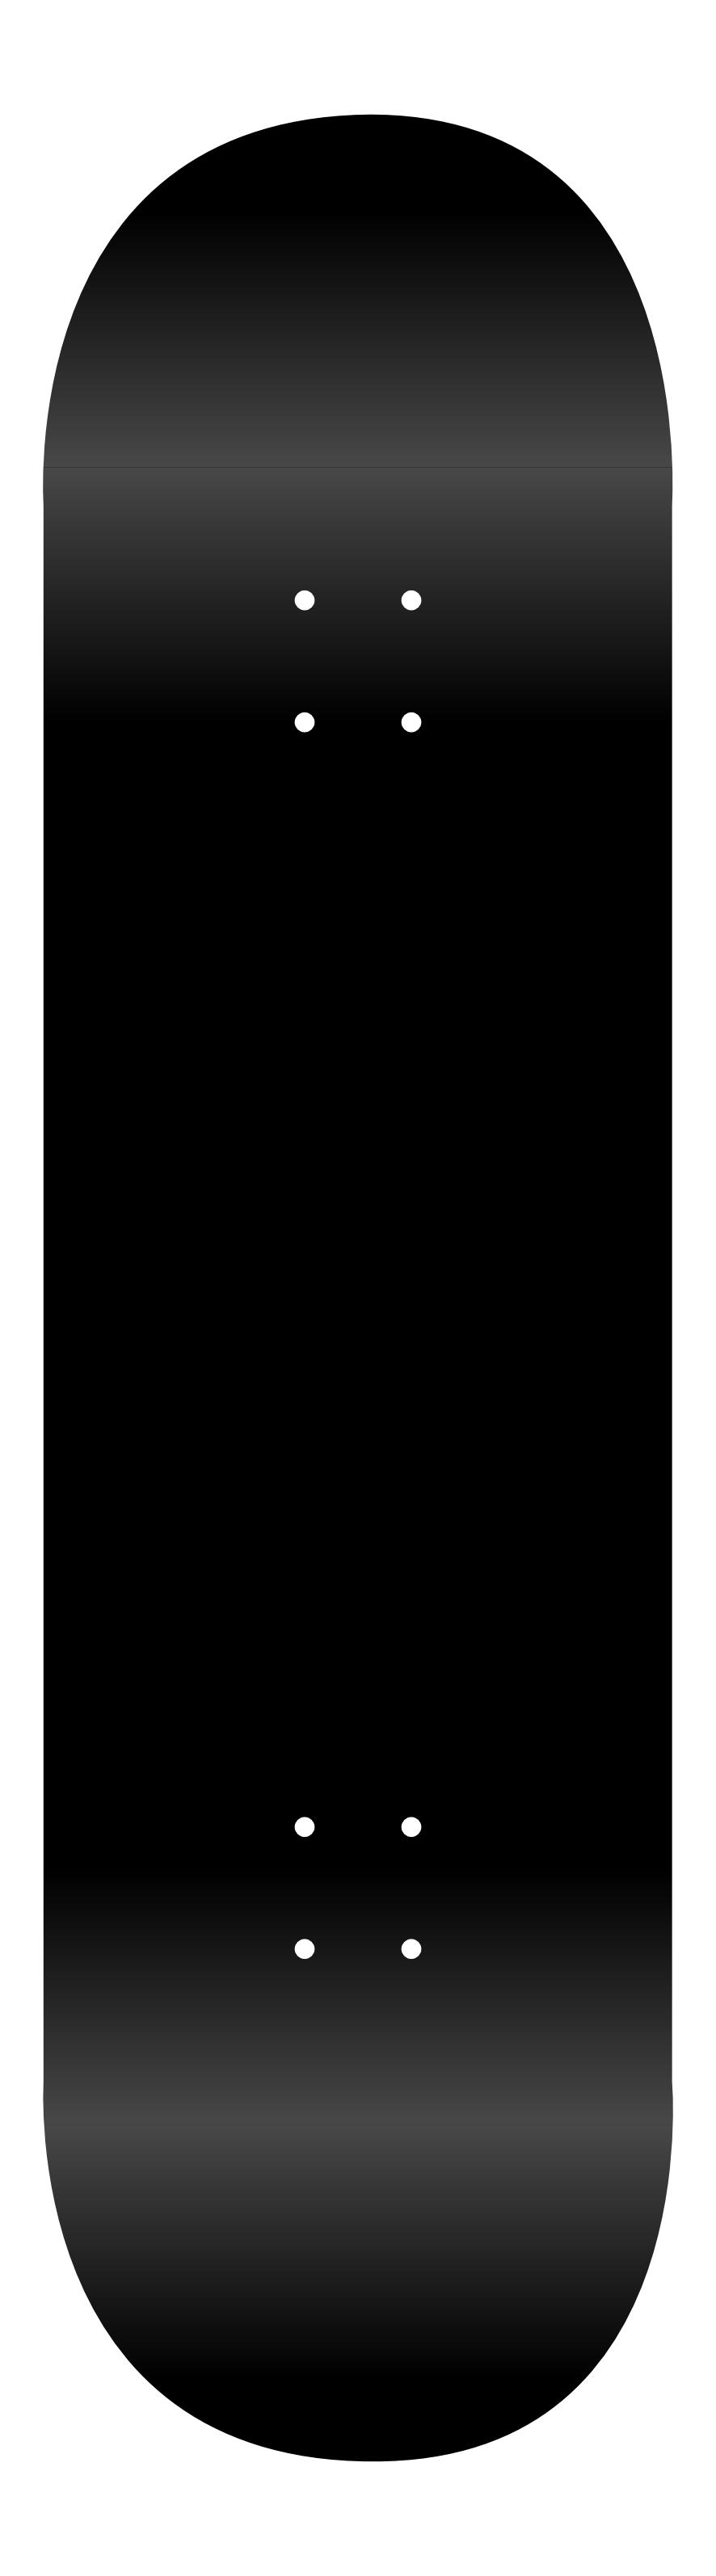 886x3189 Skateboard Vector Template